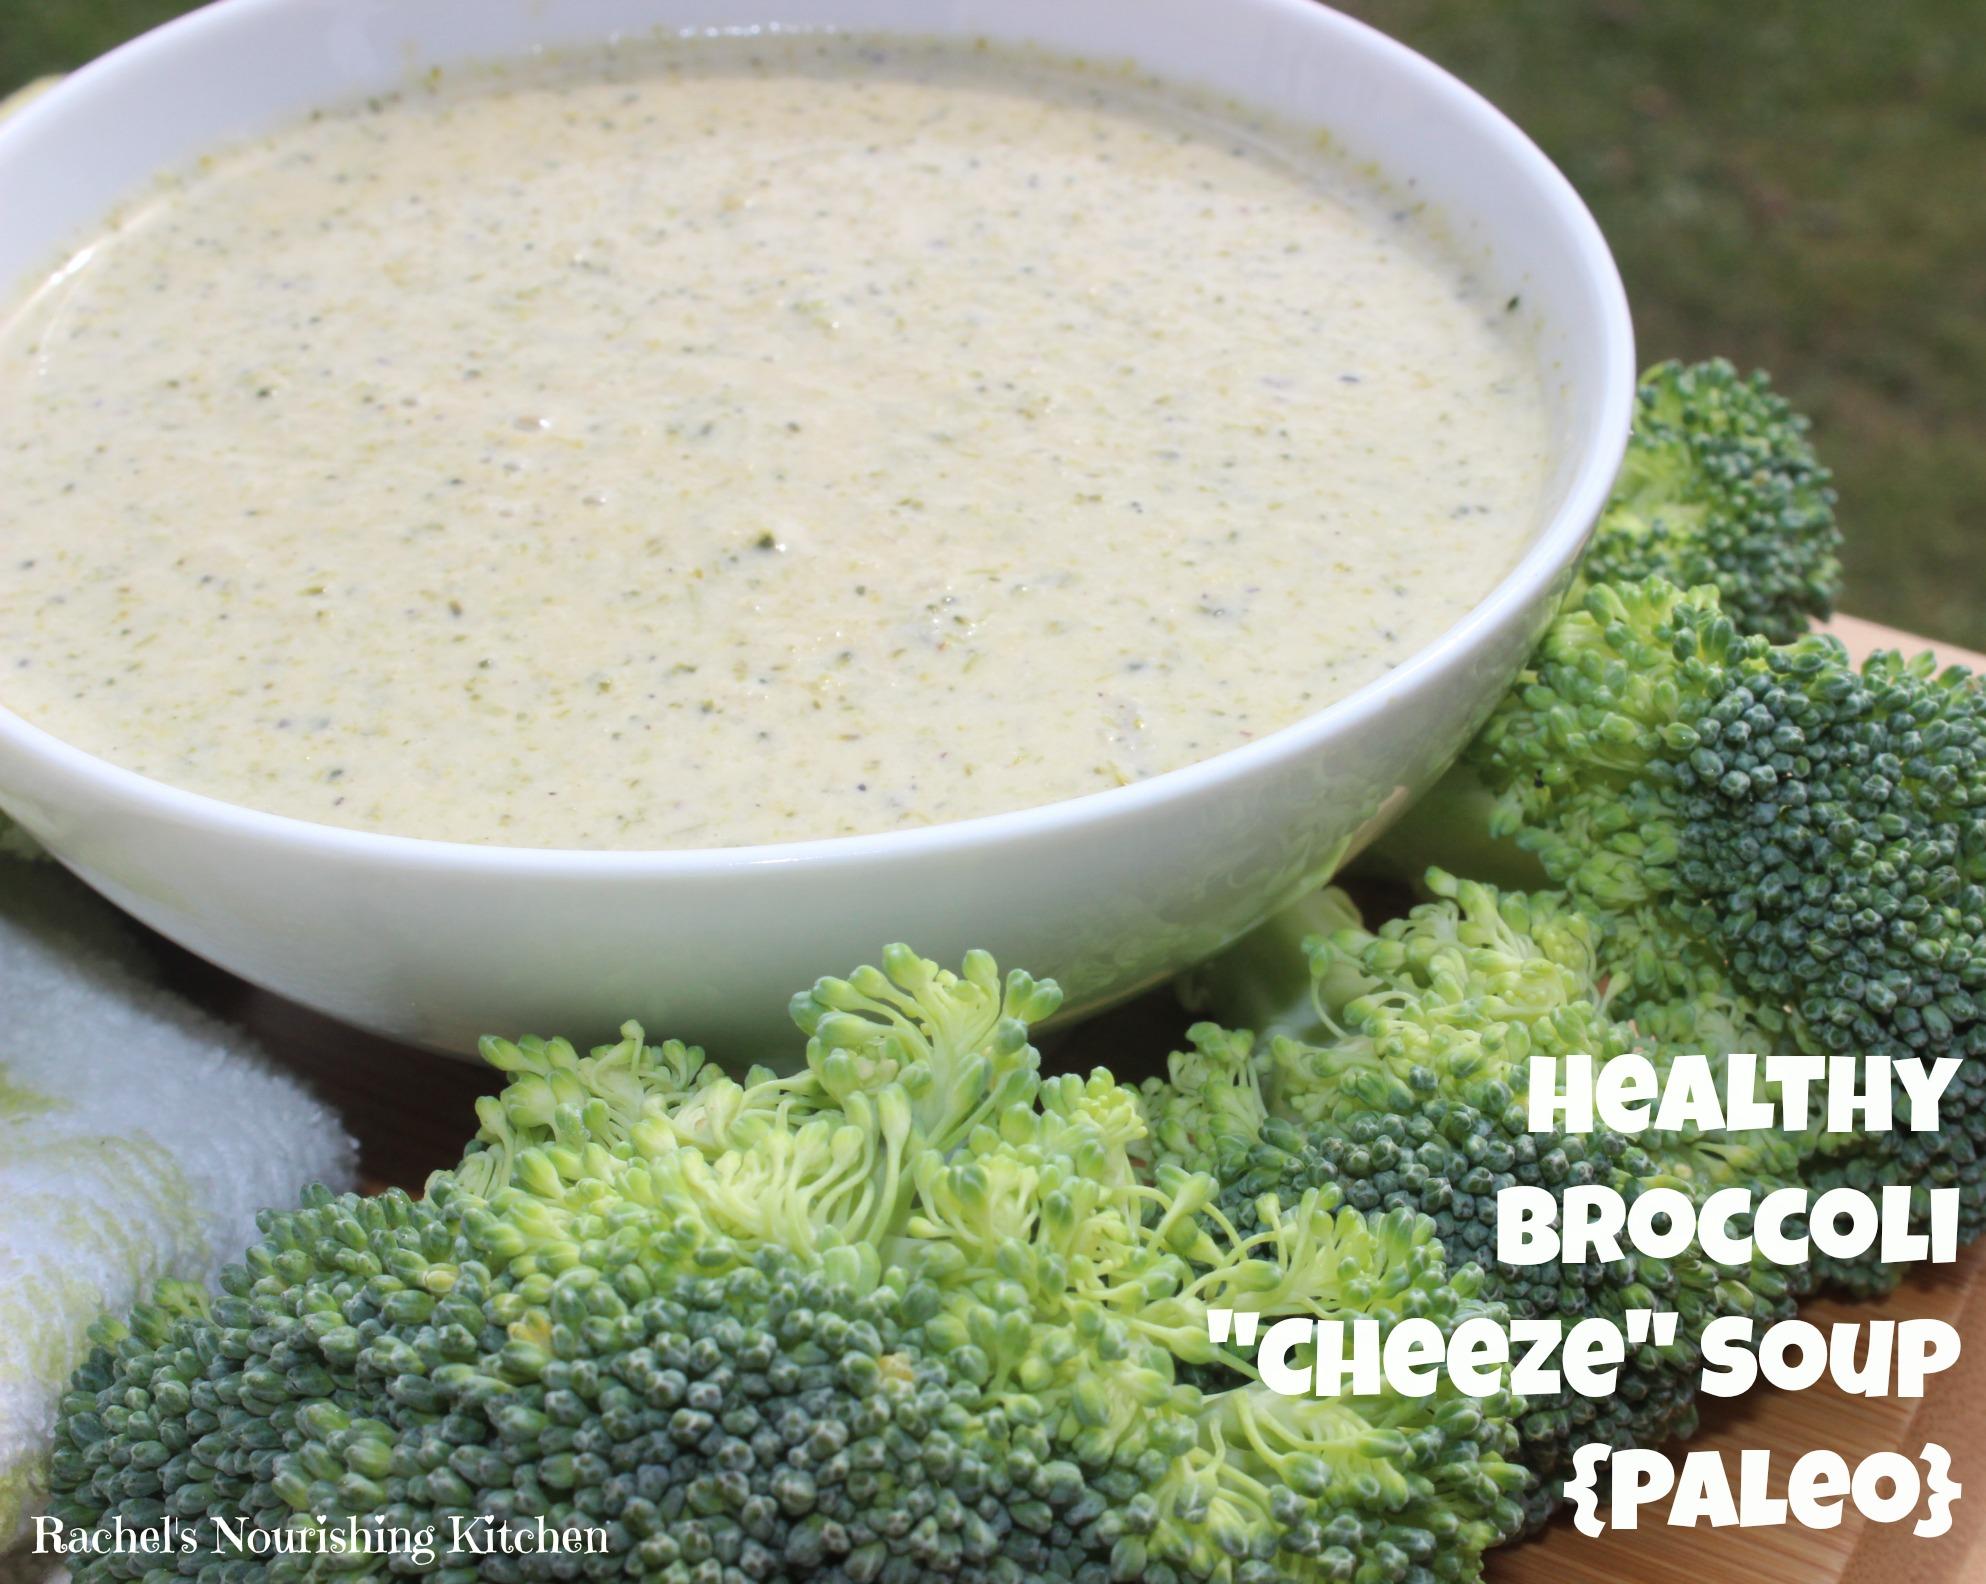 broccoli cheddar soup broccoli arugula soup broccoli cheddar ale soup ...